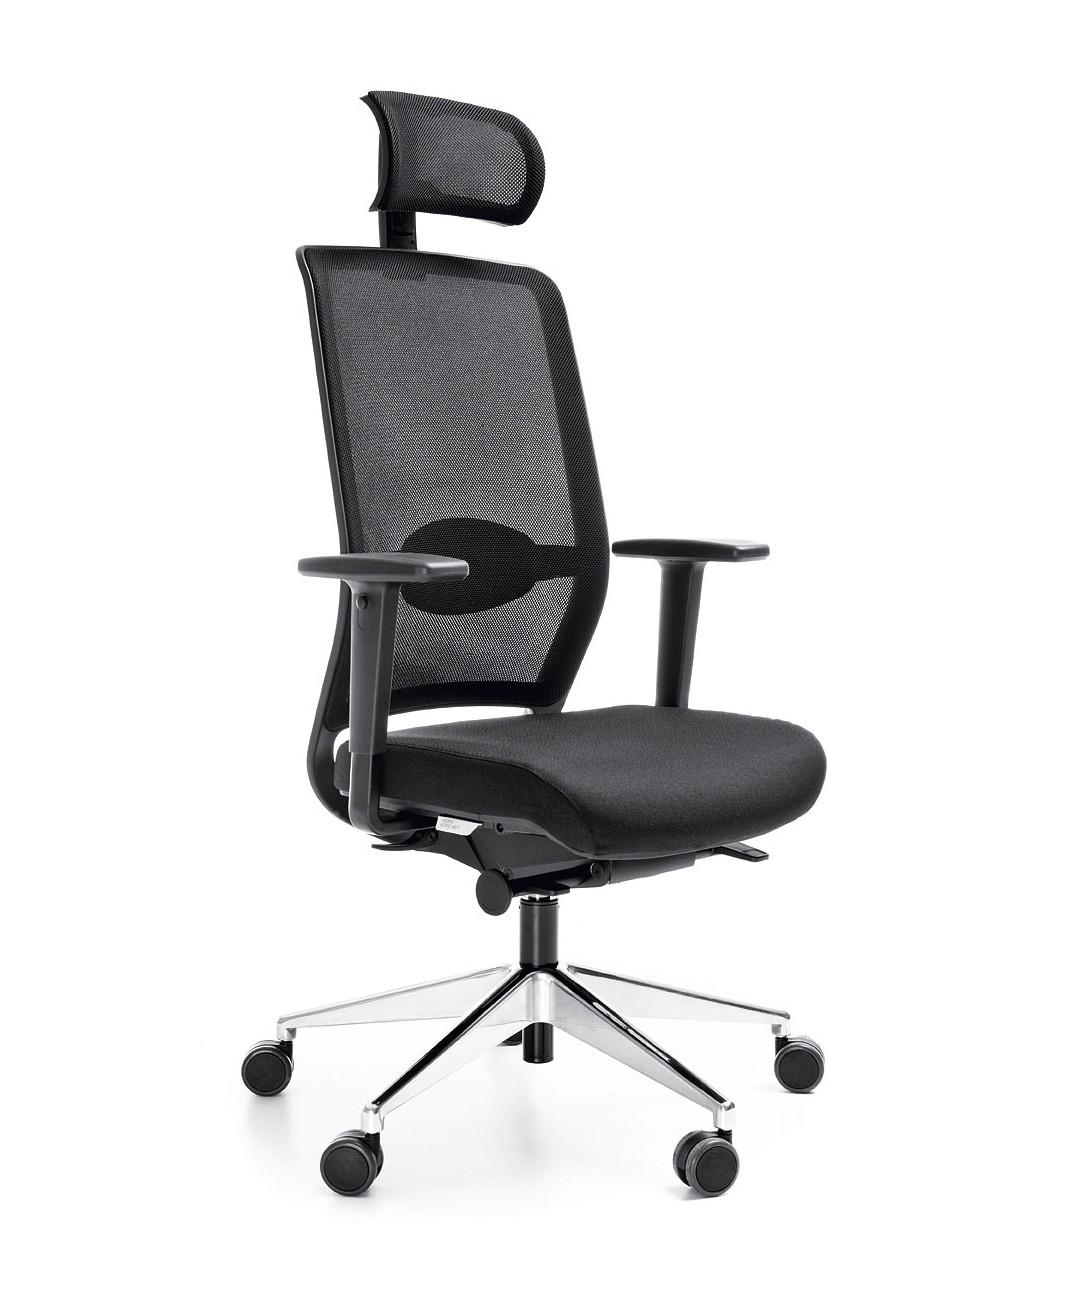 profim Drehstuhl Veris 11 Net - Farbe und Ausstattung wählbar - Büro Stuhl